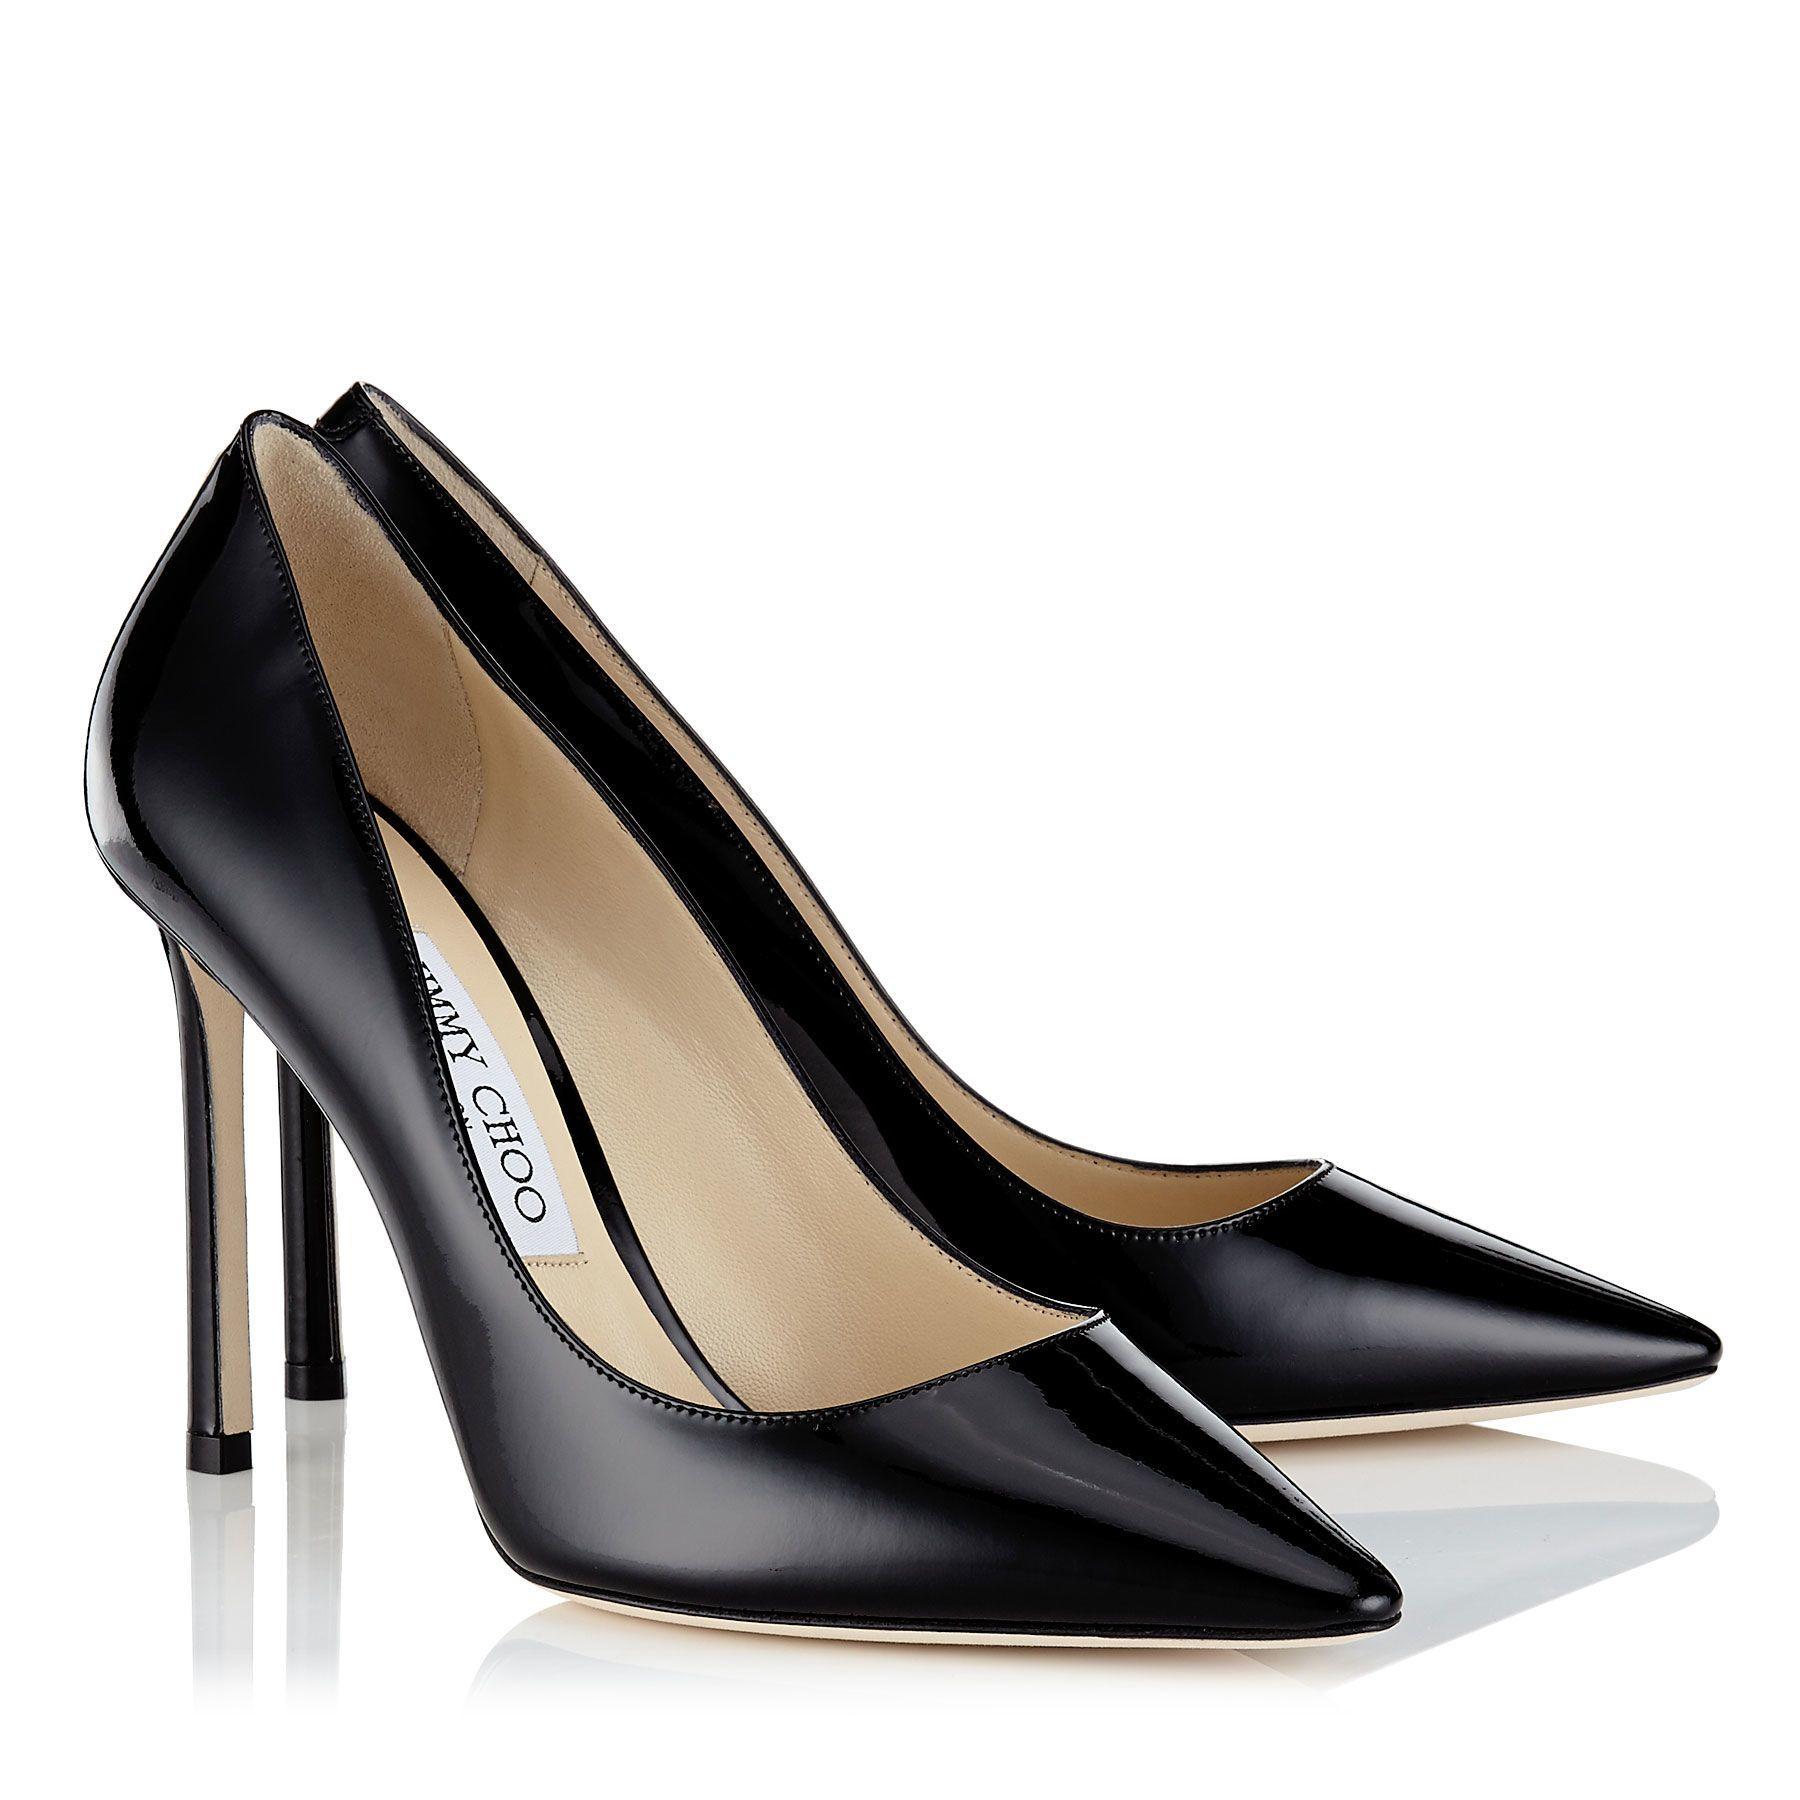 Jimmy choo shoes black, Stiletto heels